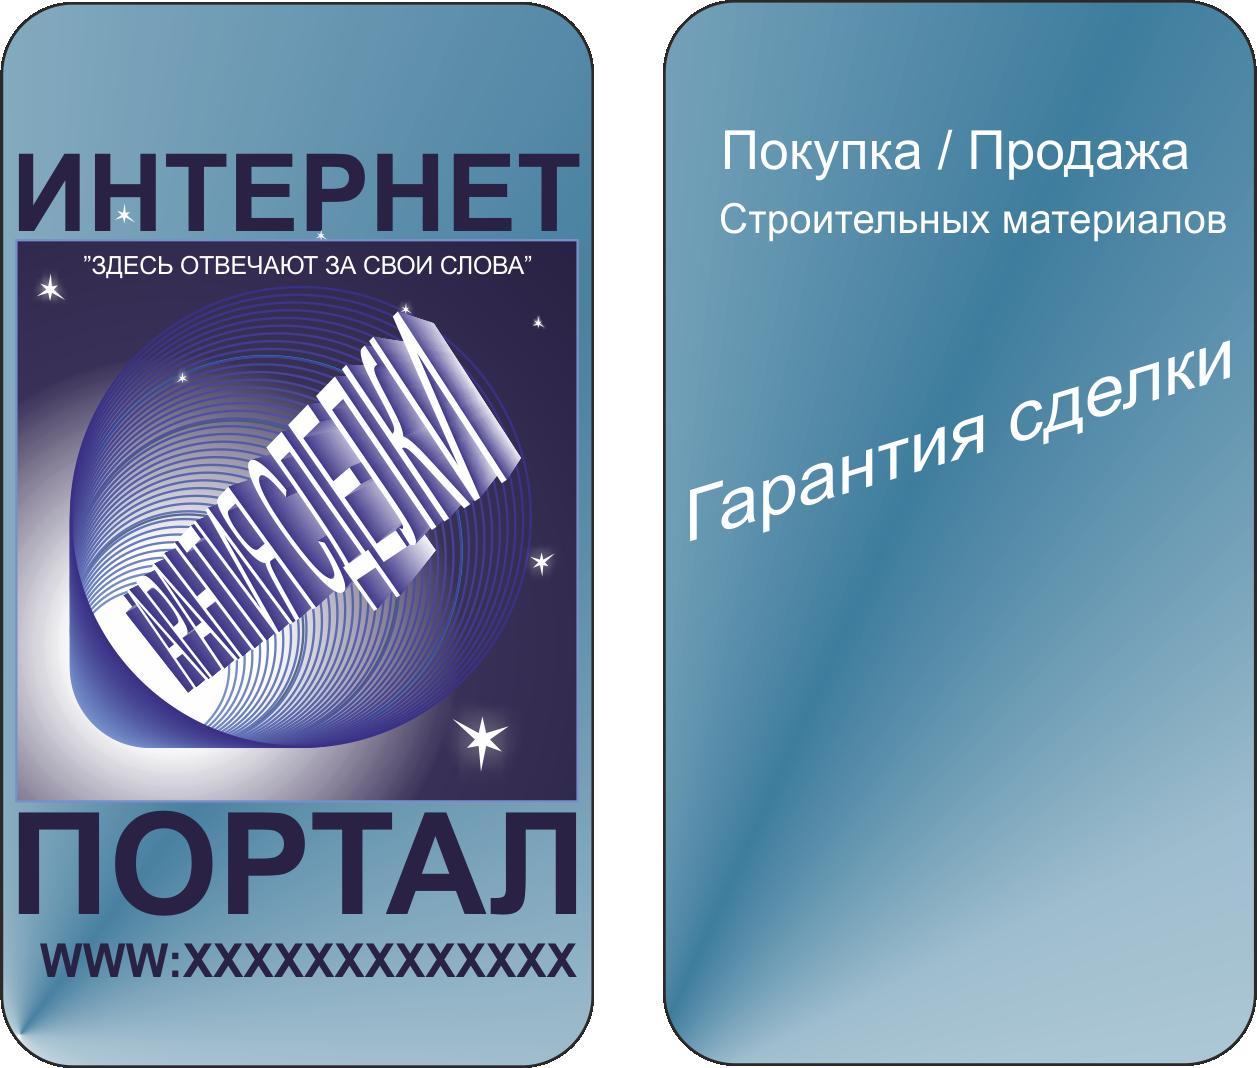 Логотип + Визитка Портала безопасных сделок фото f_00753614b4f7b9b5.png